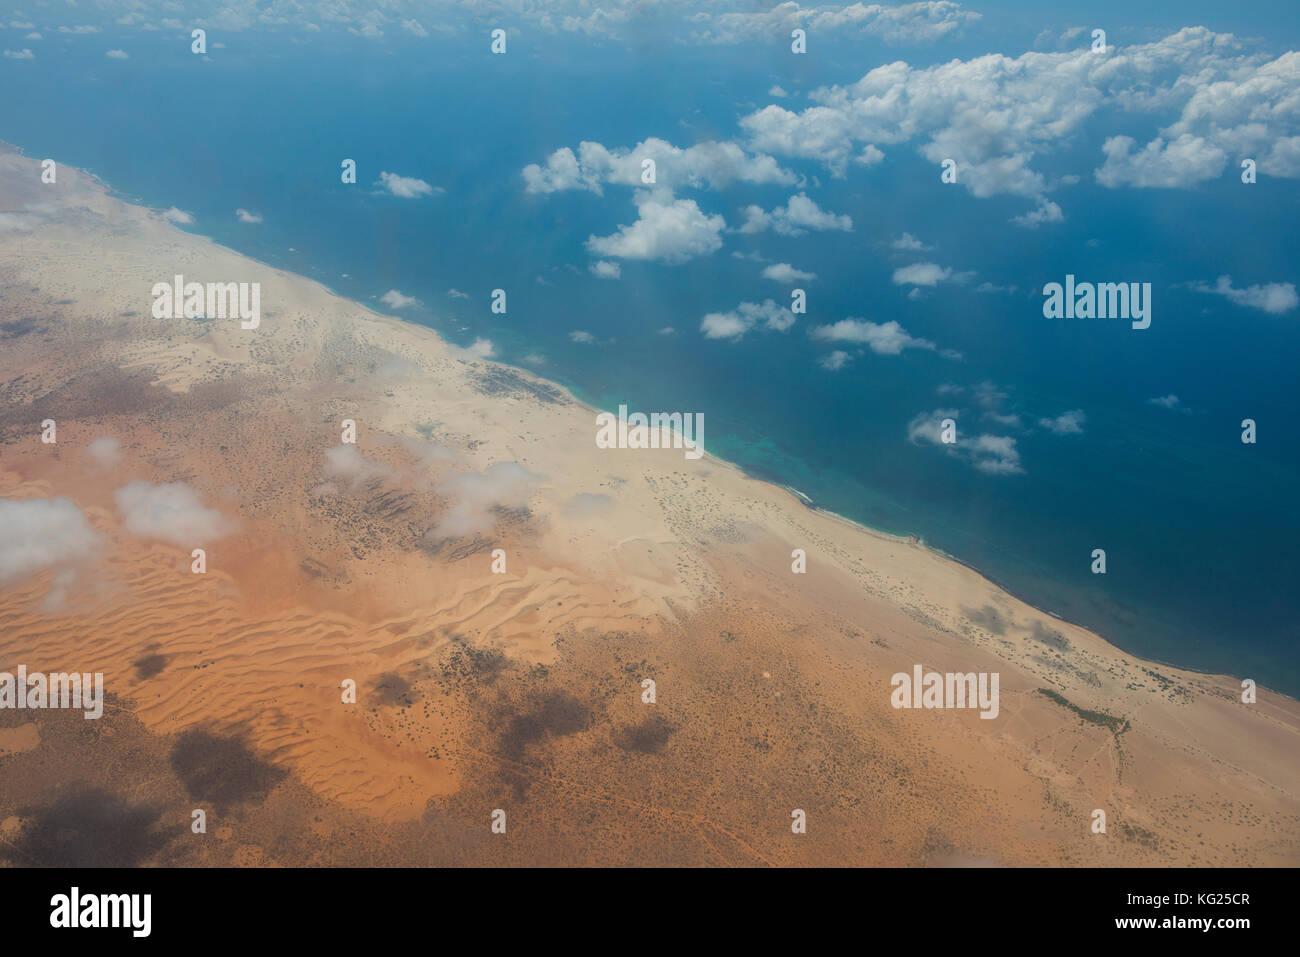 Coastline of Somalia, Africa - Stock Image